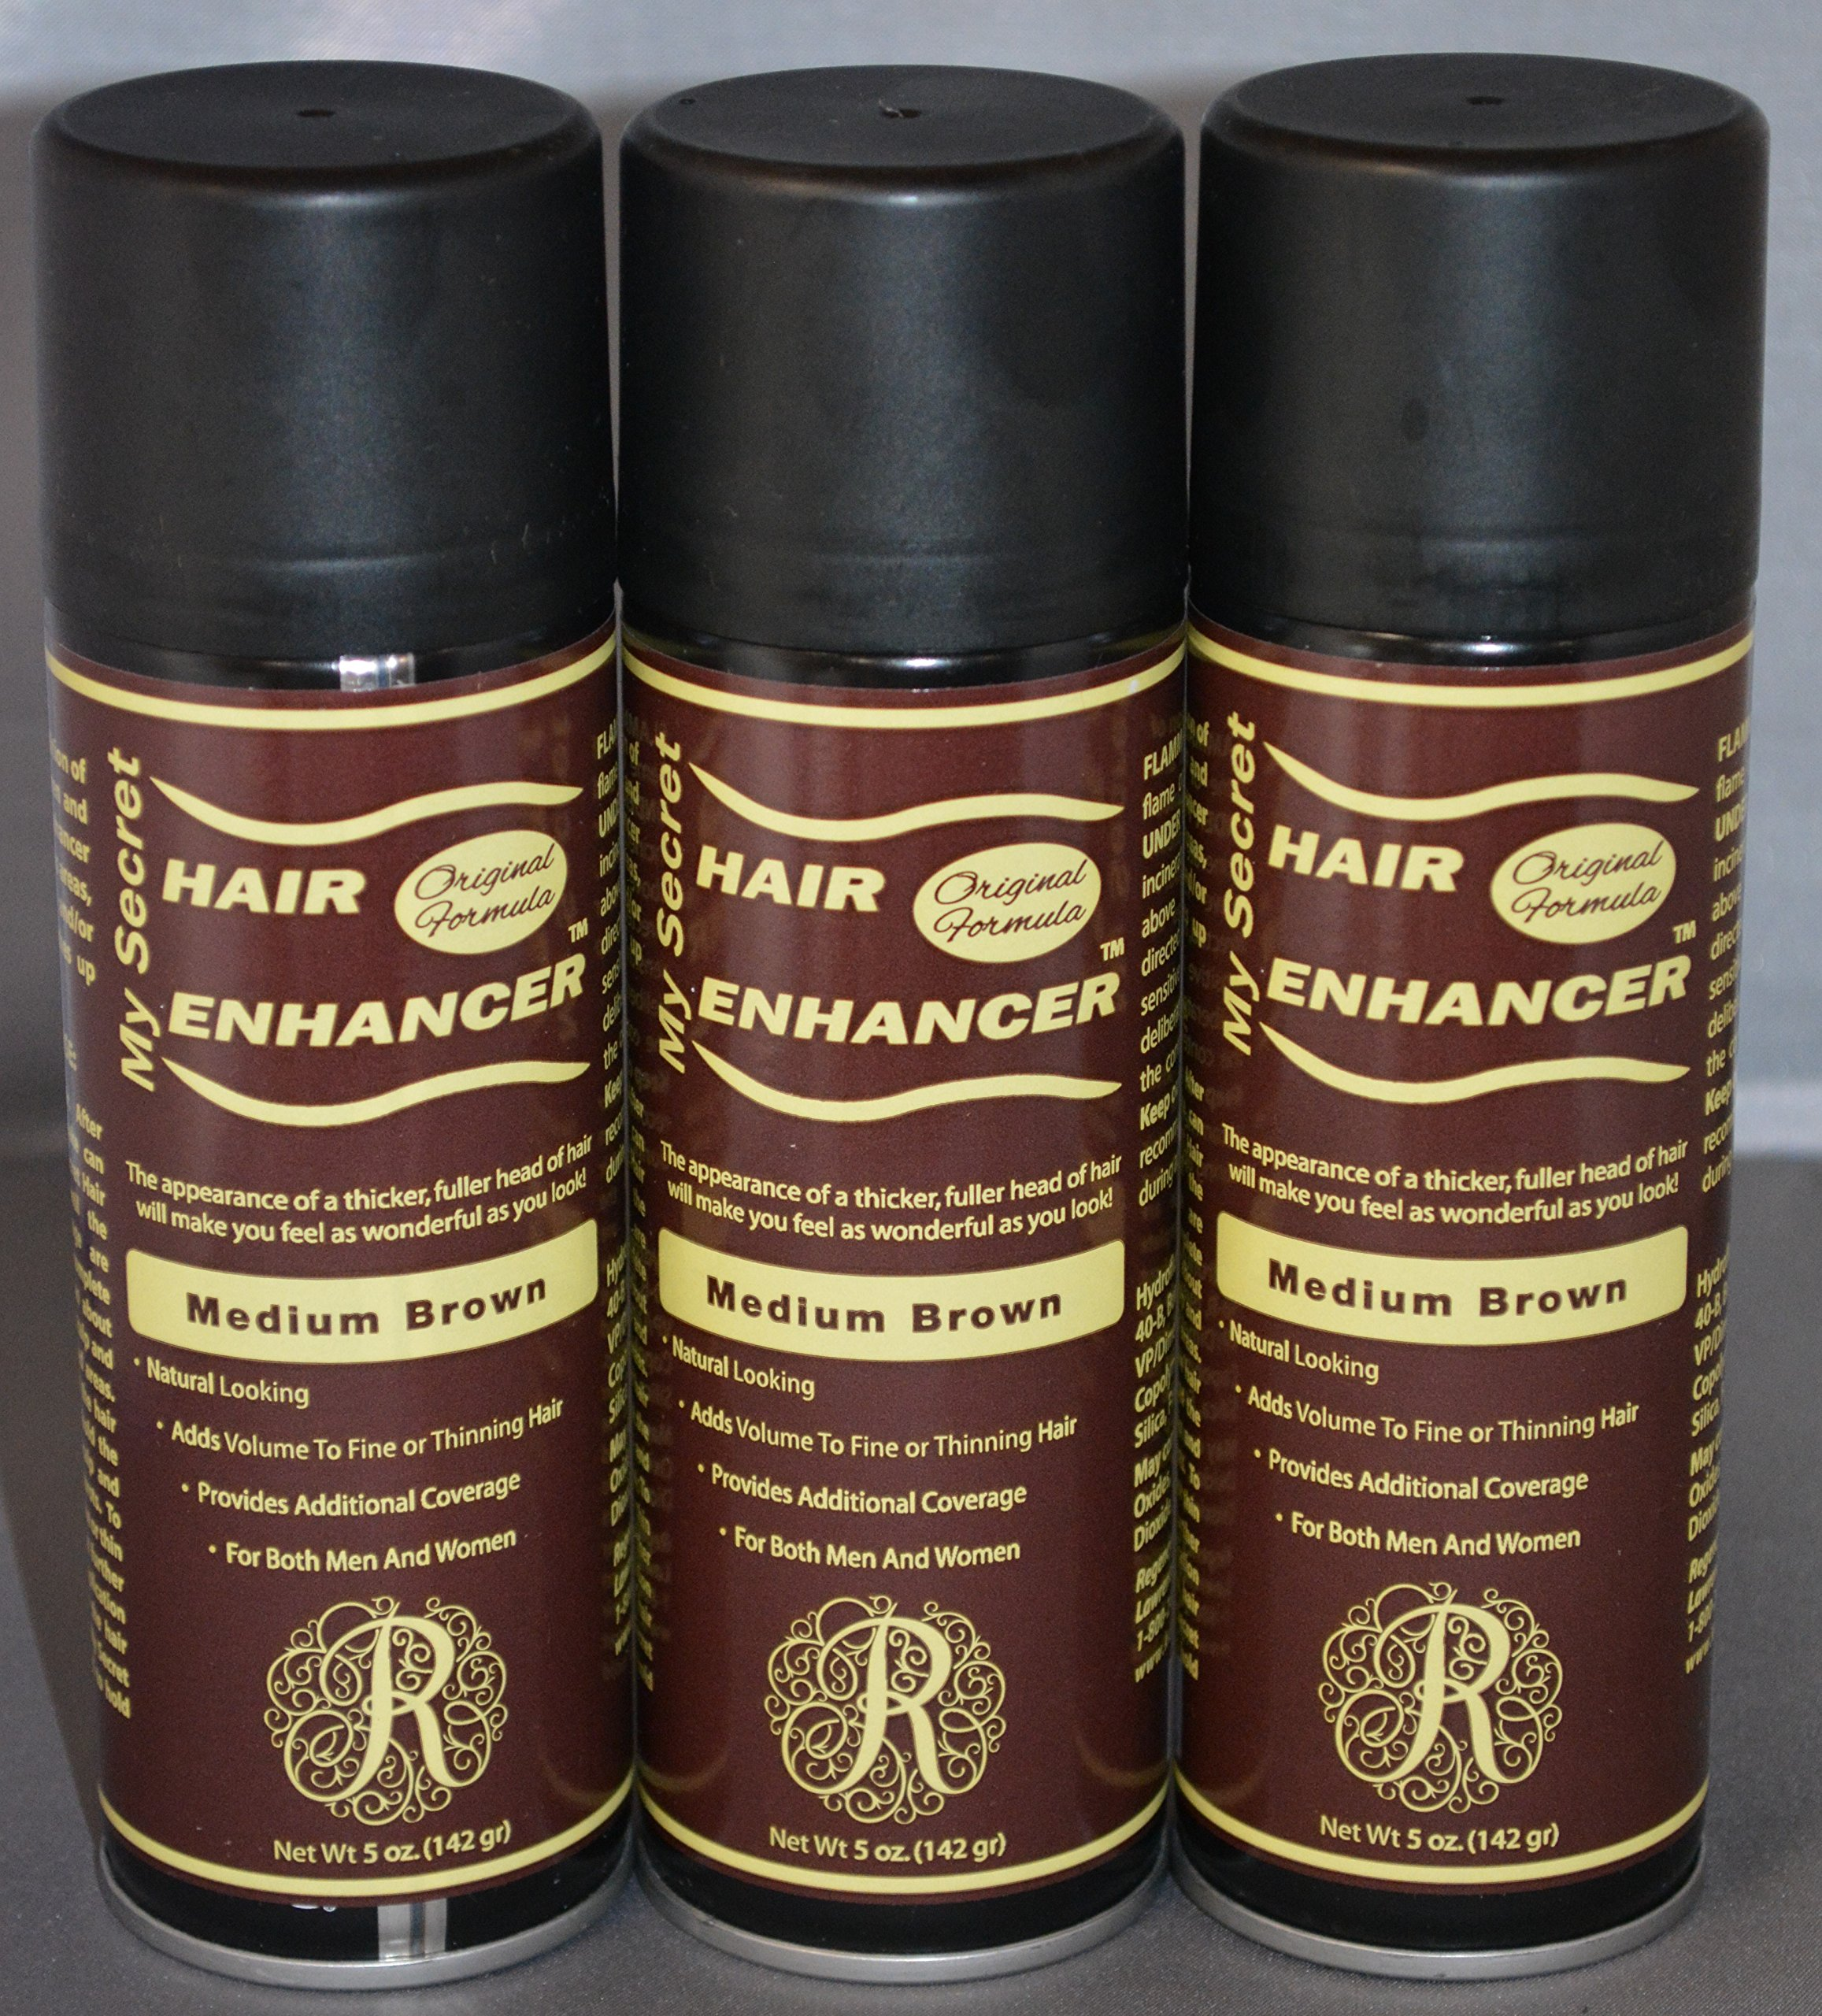 My Secret Hair Enhancer Medium Brown 5 oz. (3 Pack)